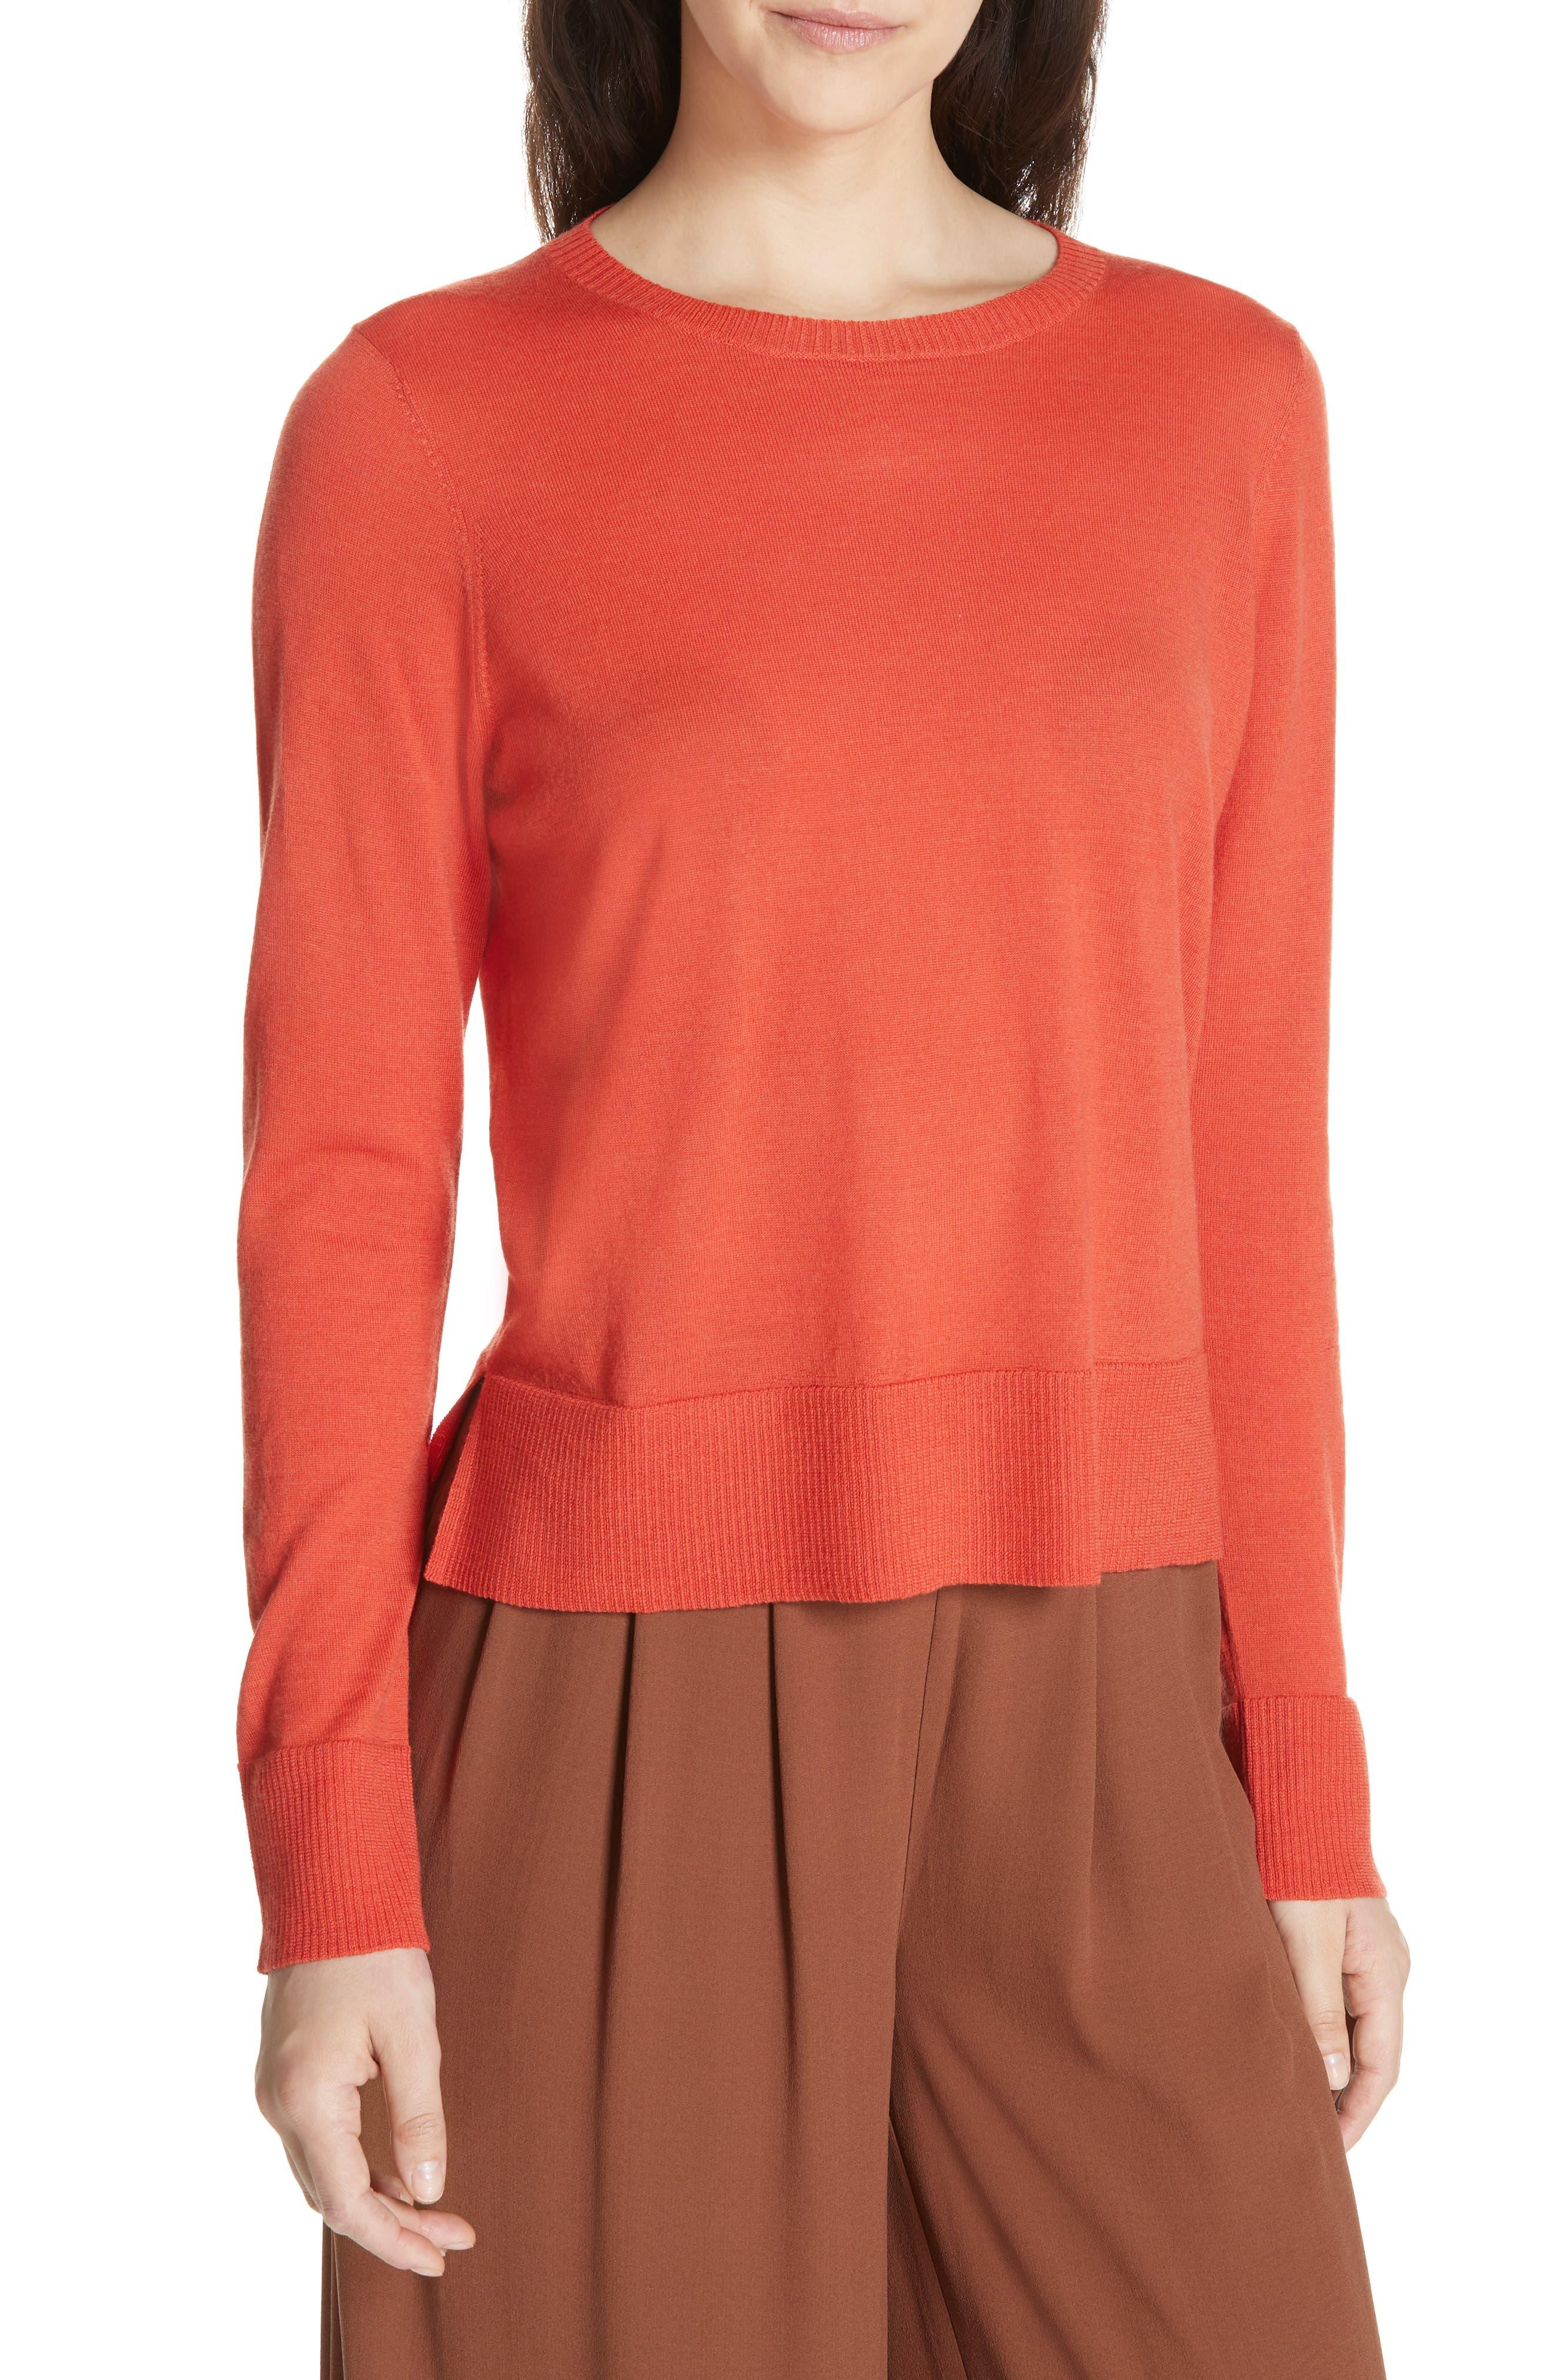 Boxy Merino Wool Sweater by Eileen Fisher